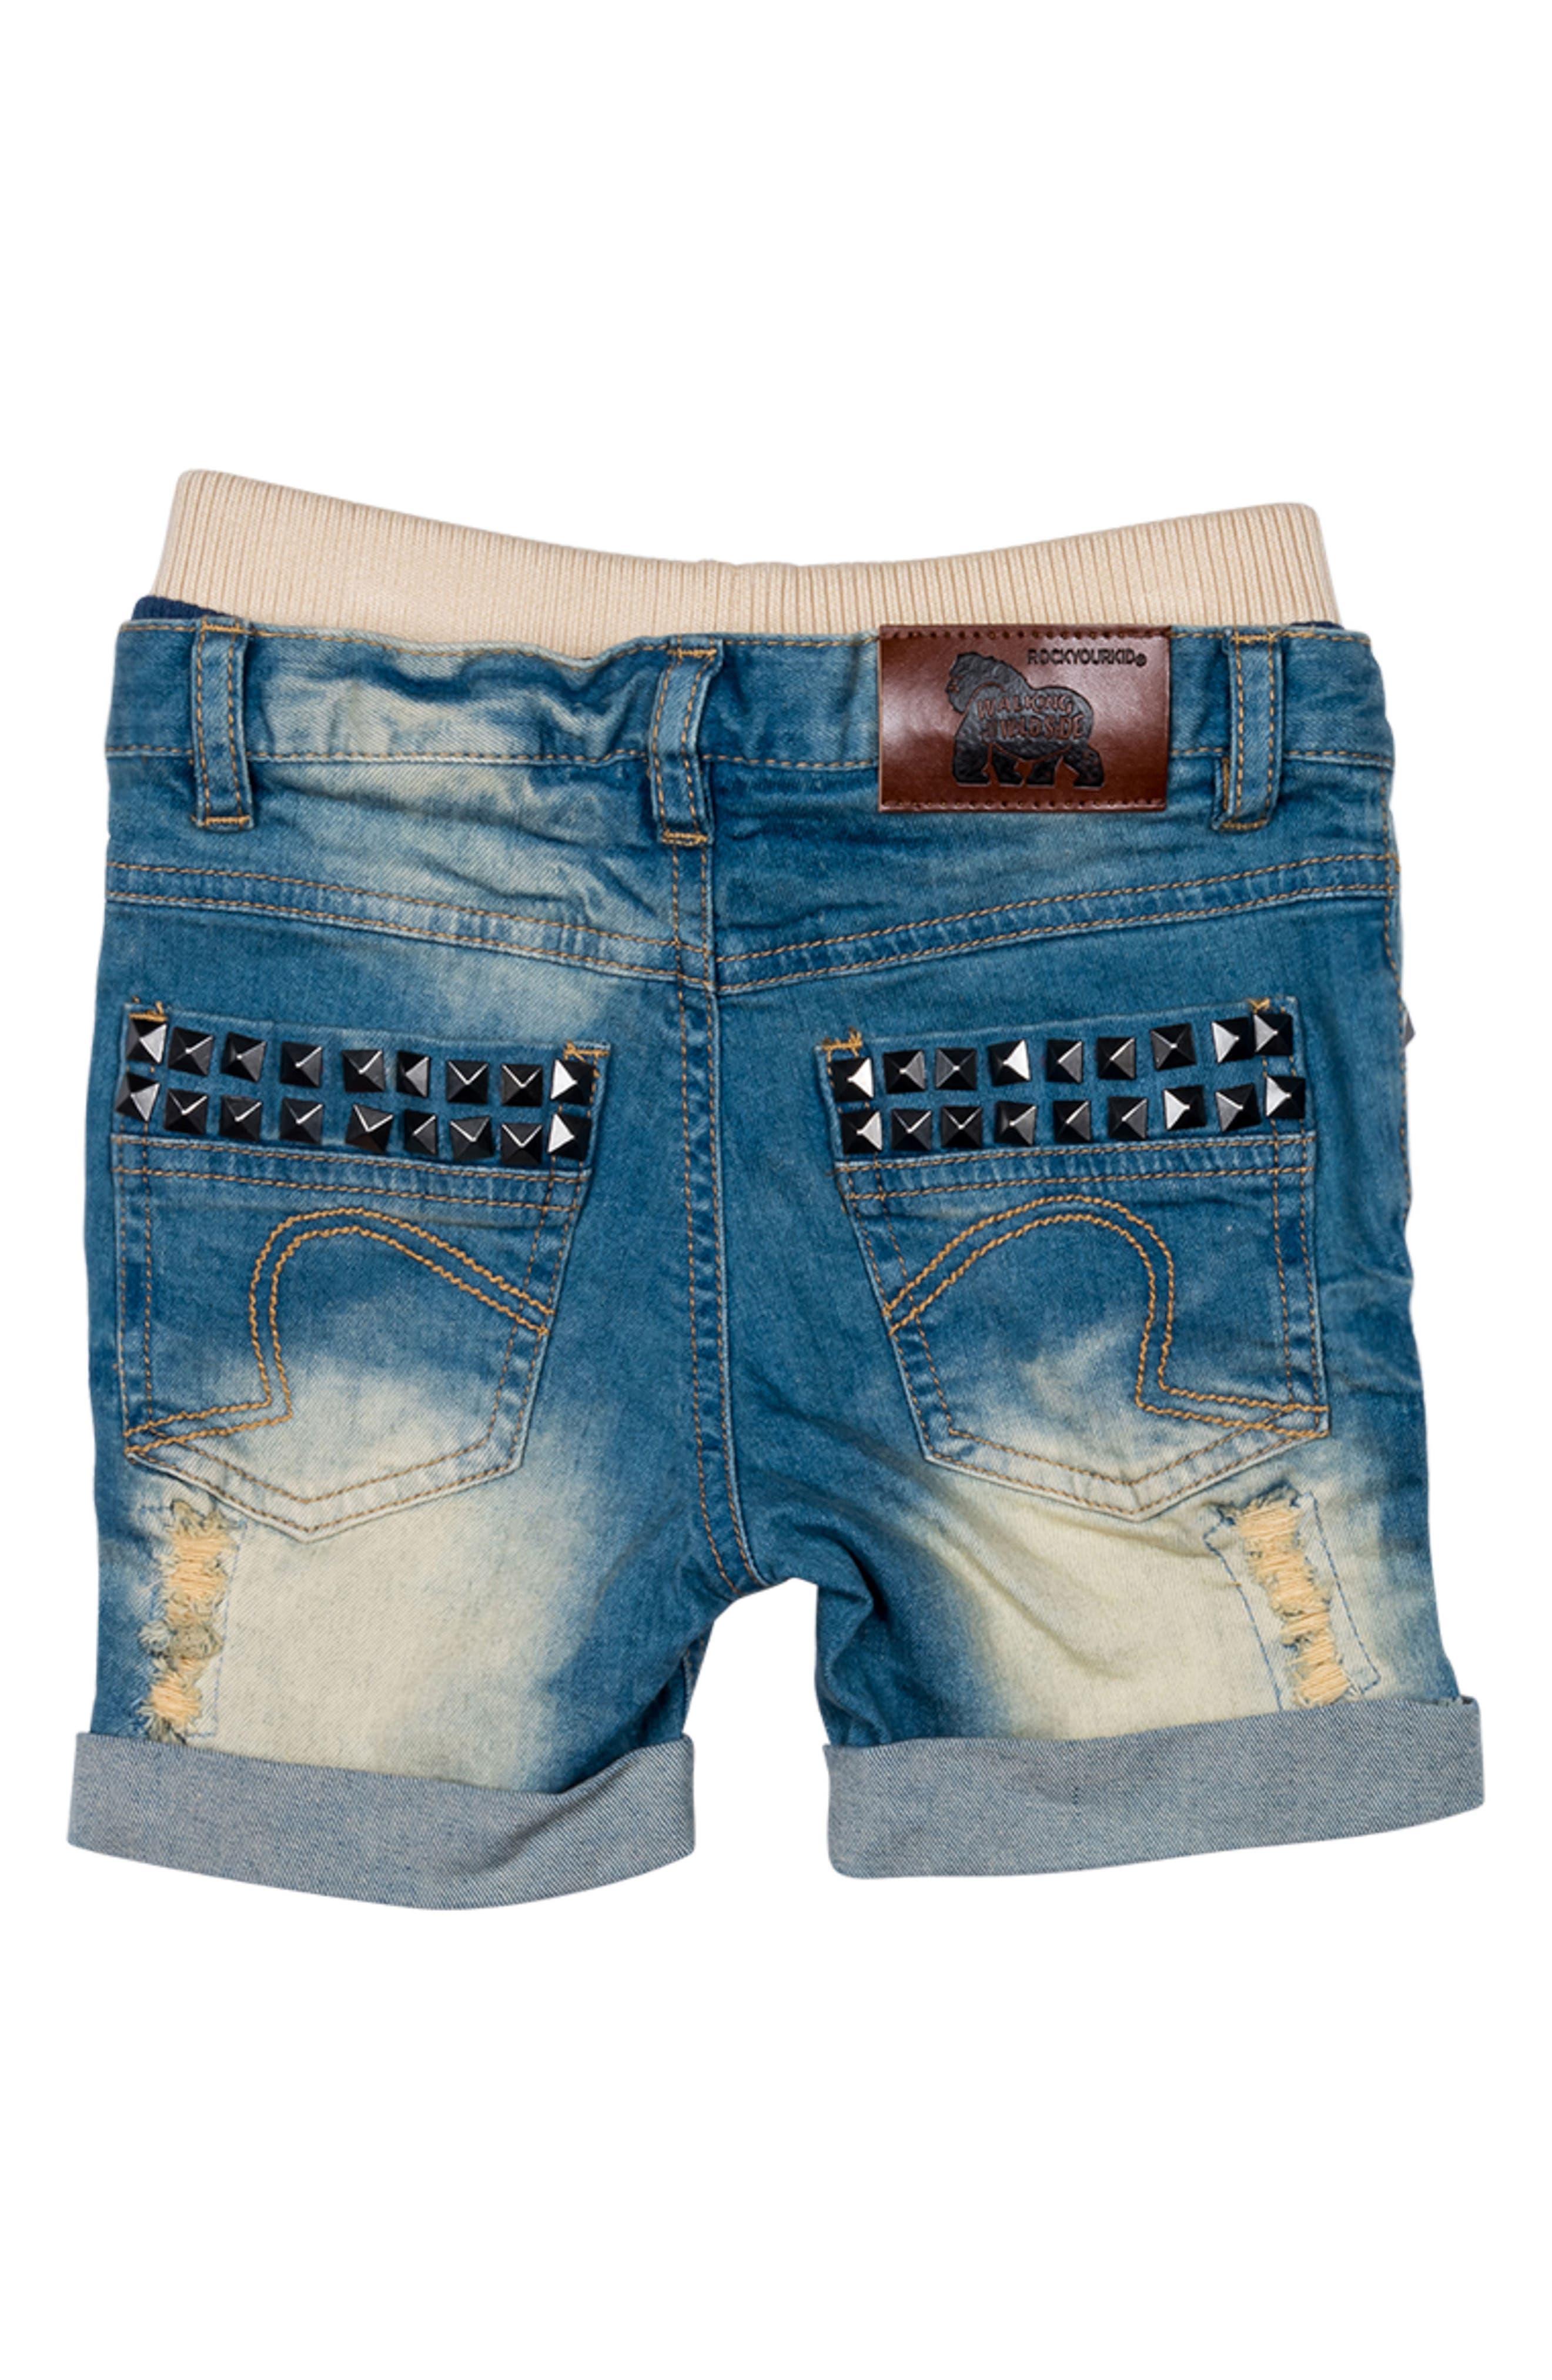 Heavy Metal Denim Shorts,                             Alternate thumbnail 2, color,                             Blue Denim